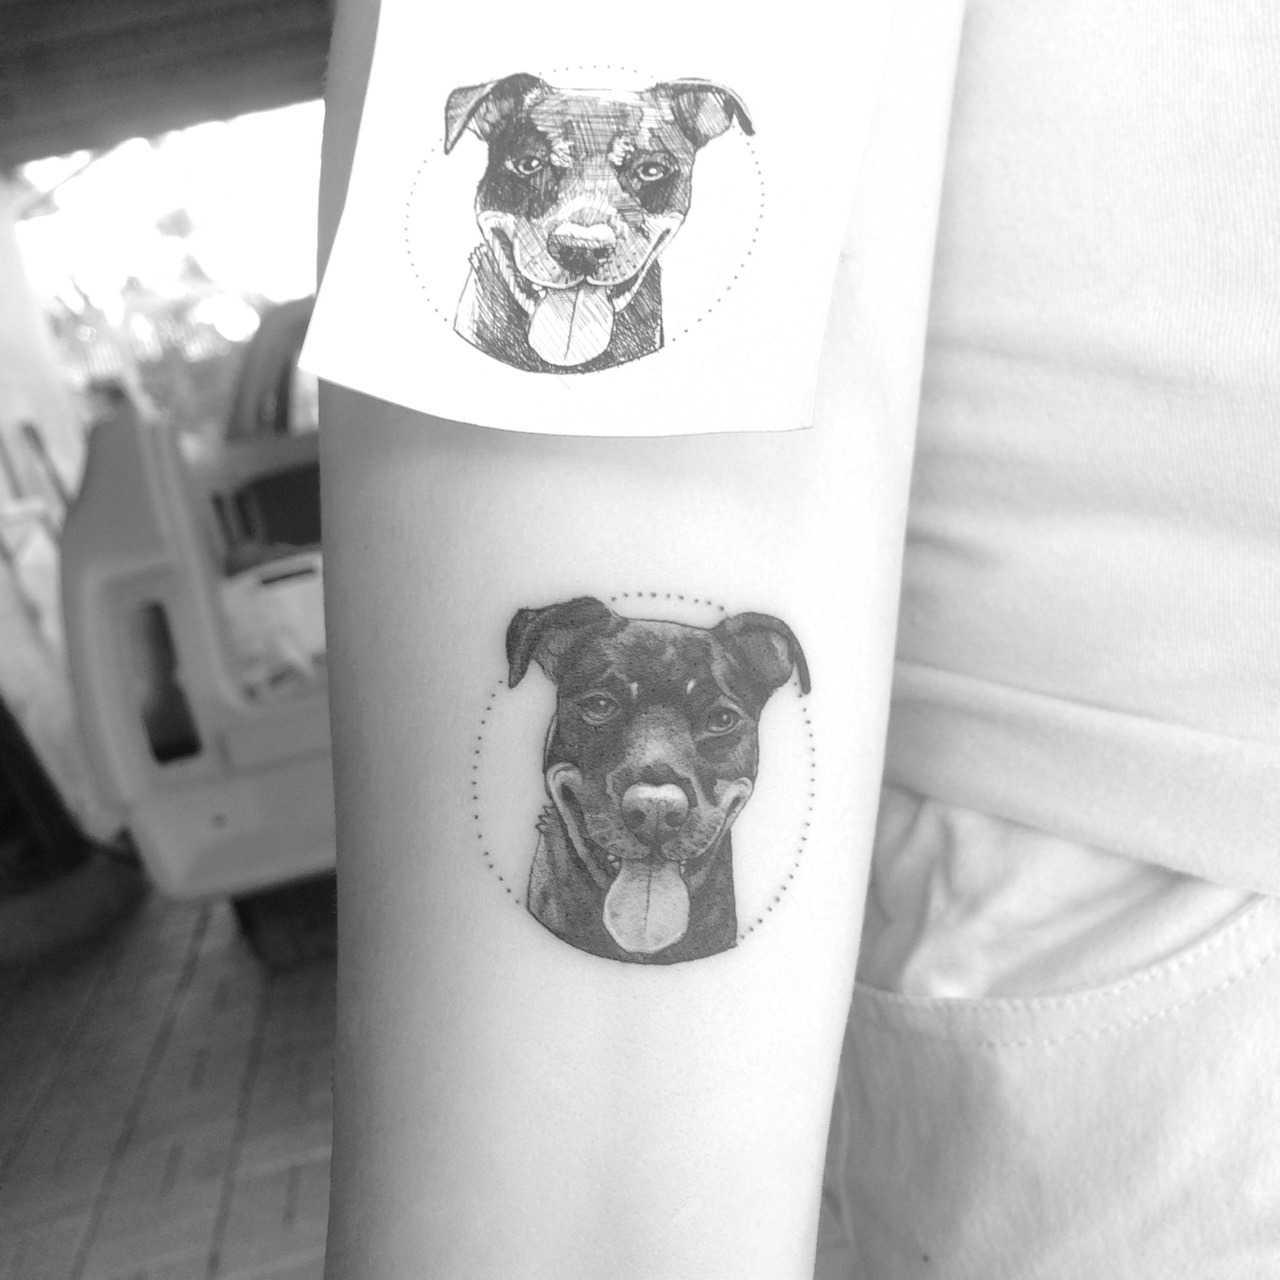 Little puppy tattoo